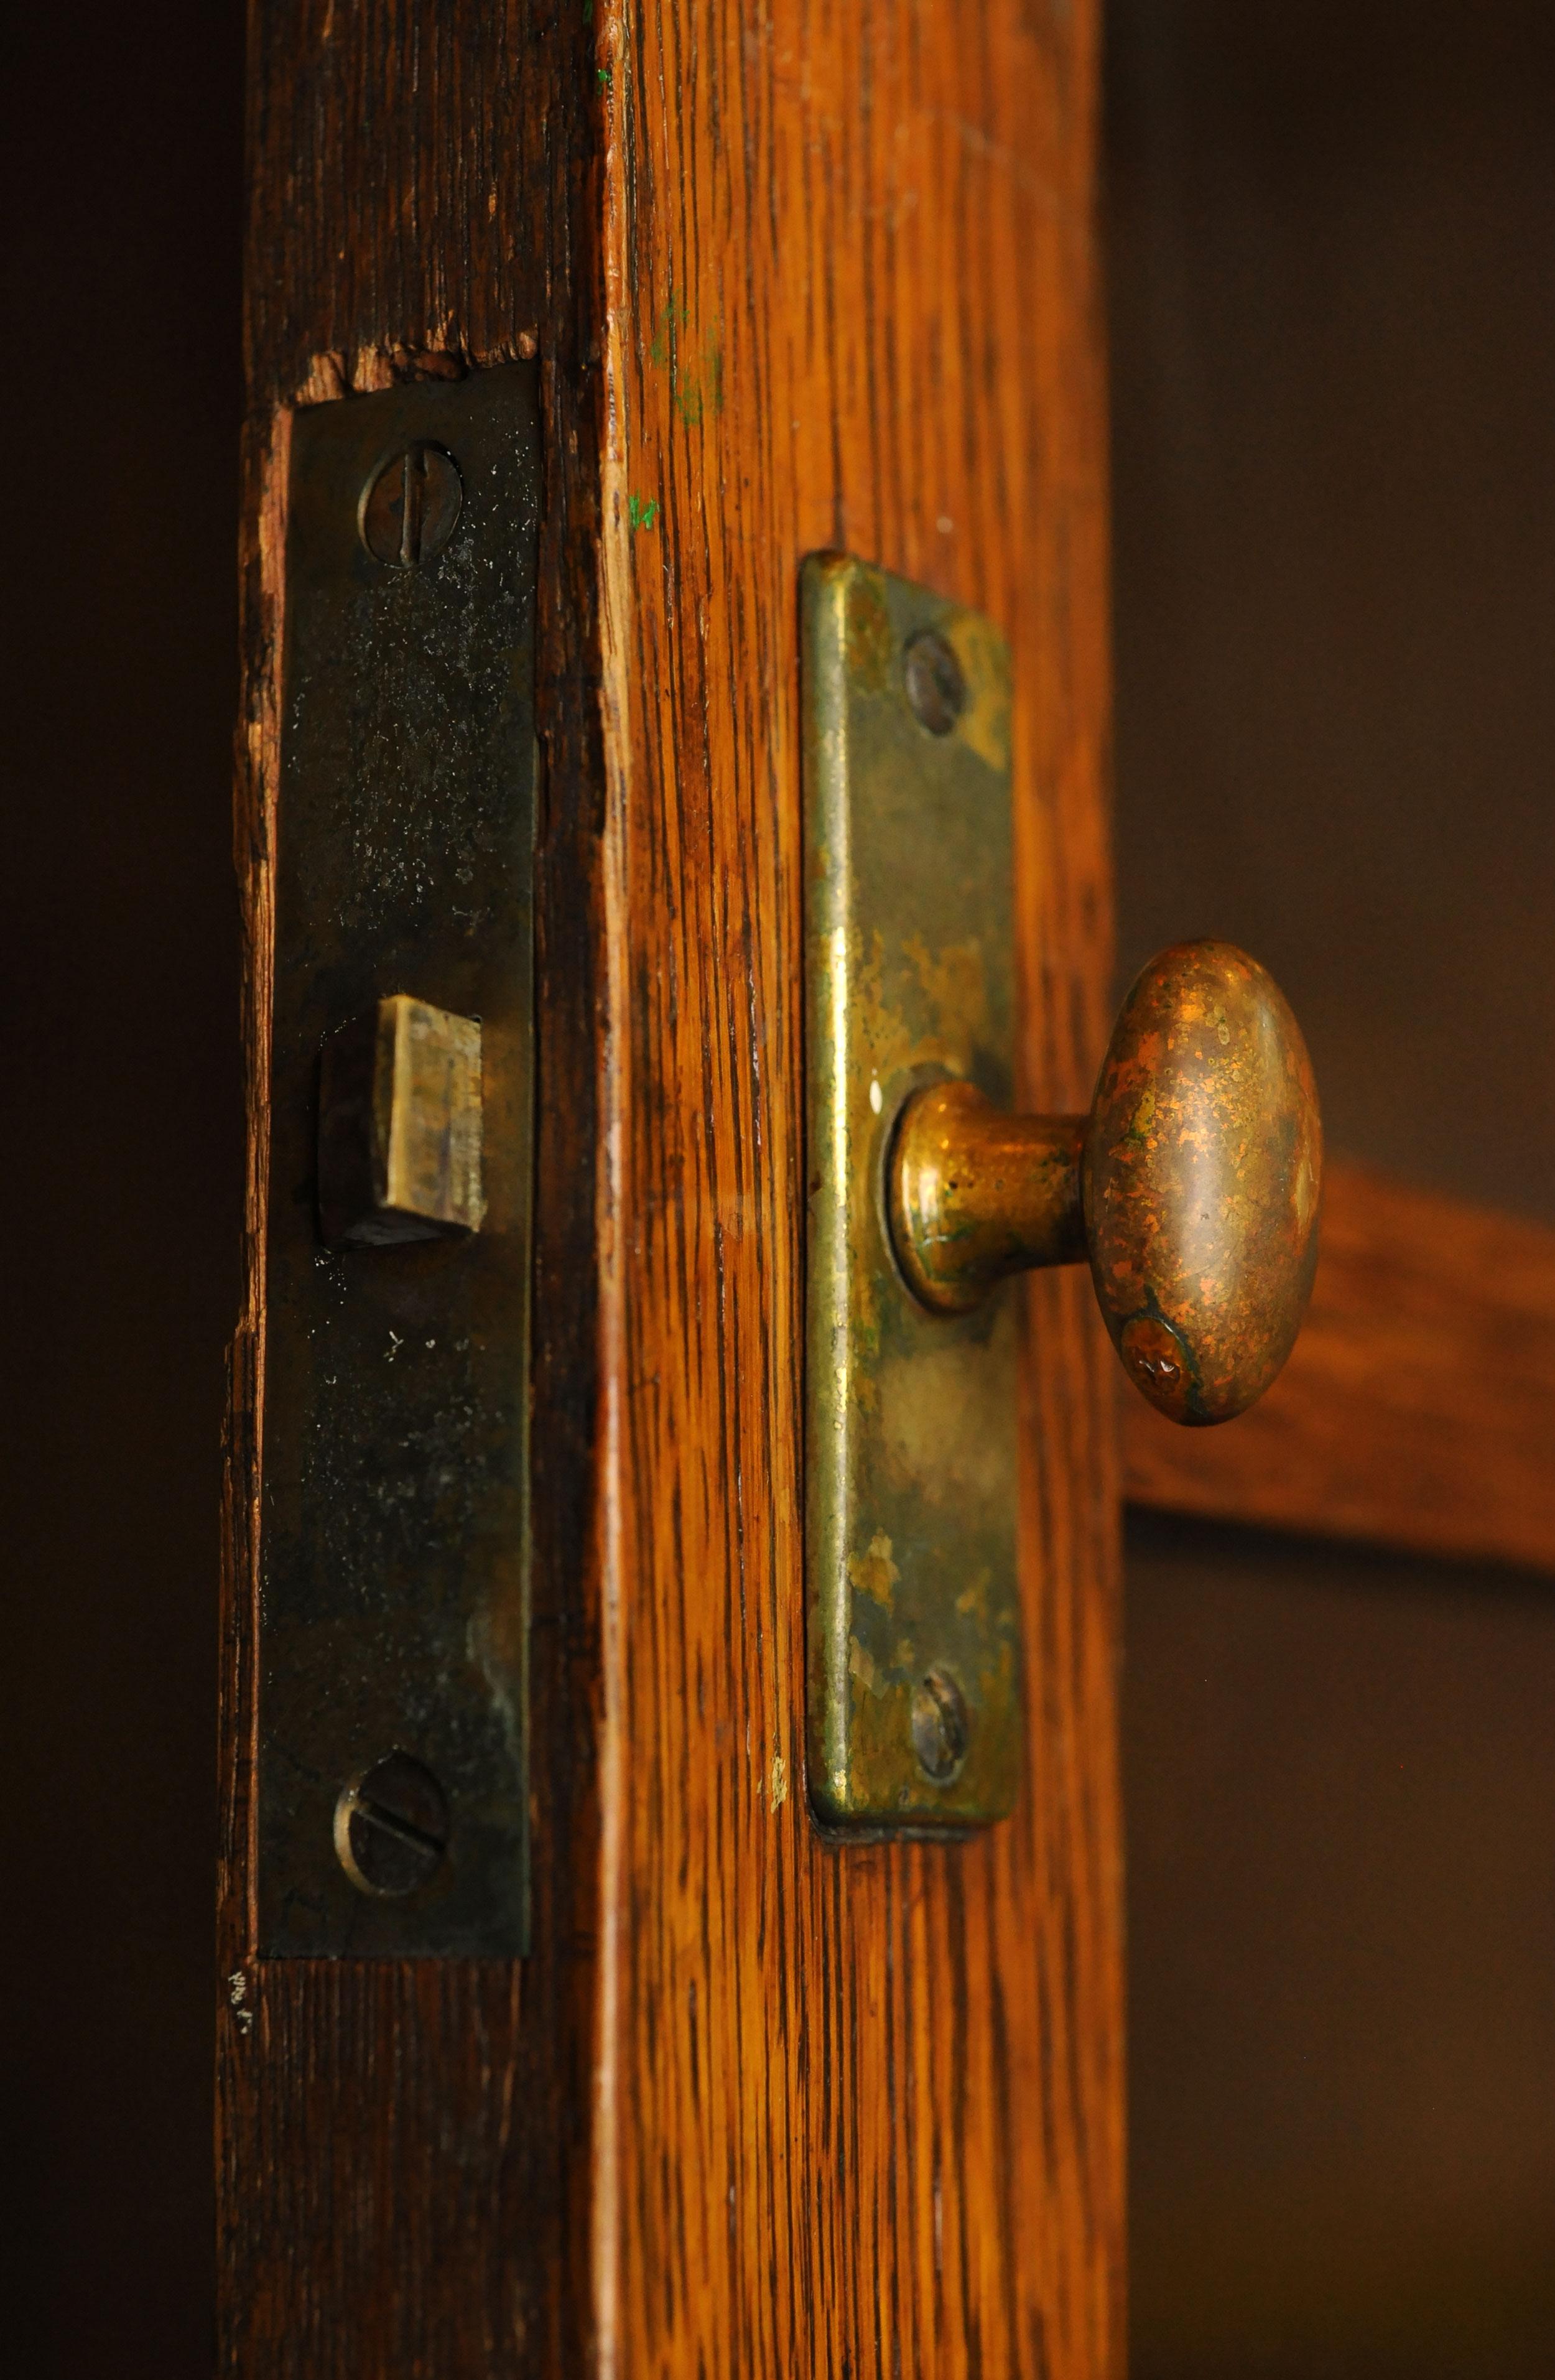 47237-built-in-schoolhouse-cabinets-hardware.jpg